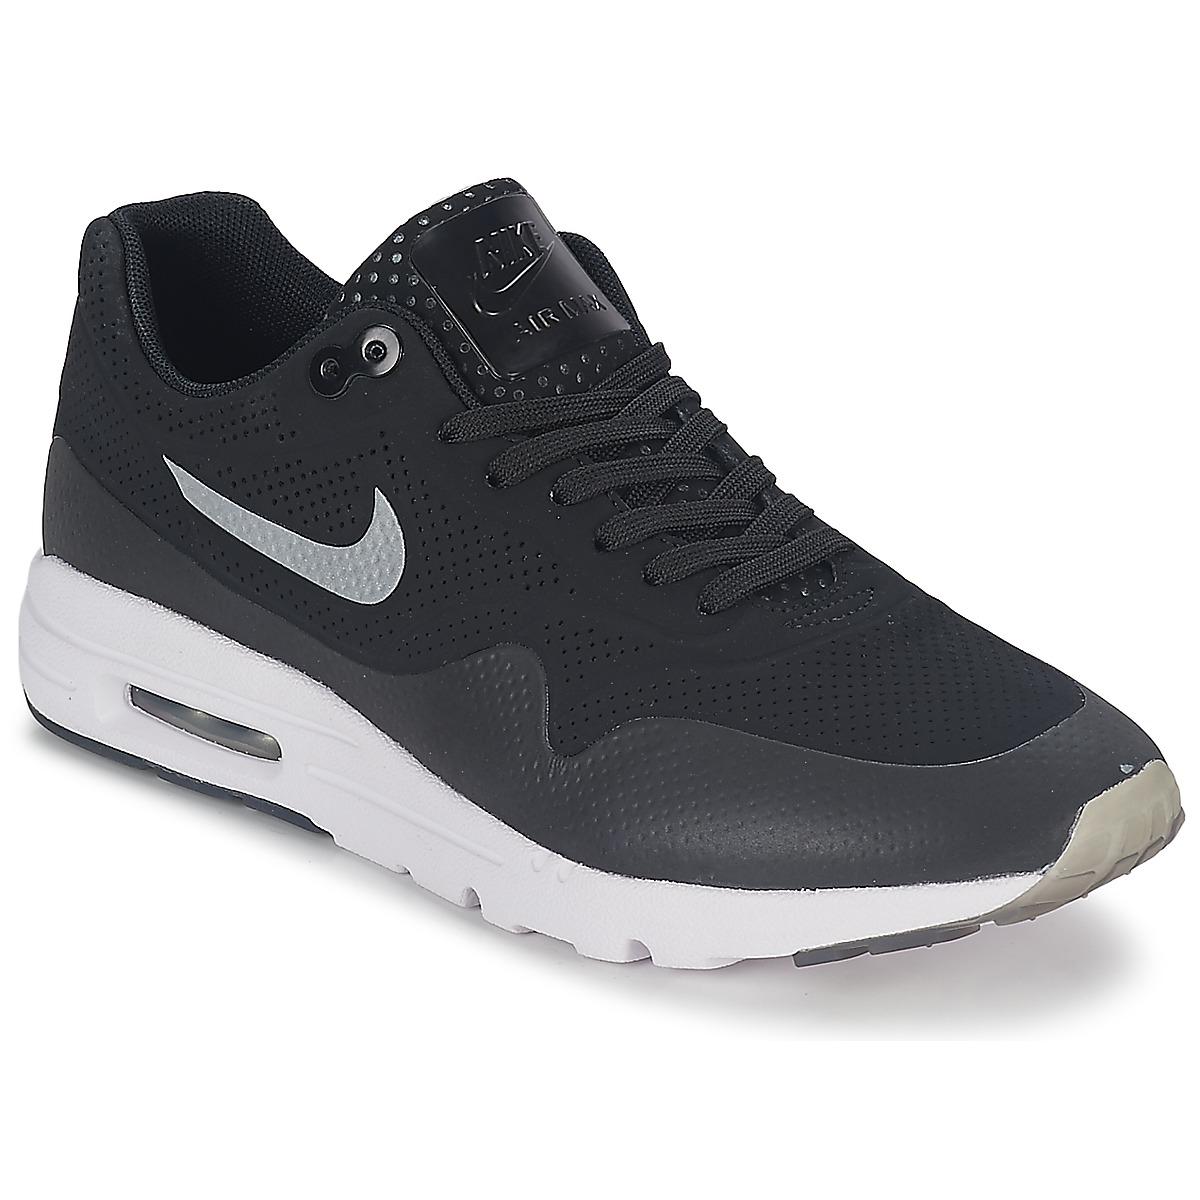 quality design 0da69 de755 Nike AIR MAX 1 ULTRA MOIRE Black - Free delivery with Sparto